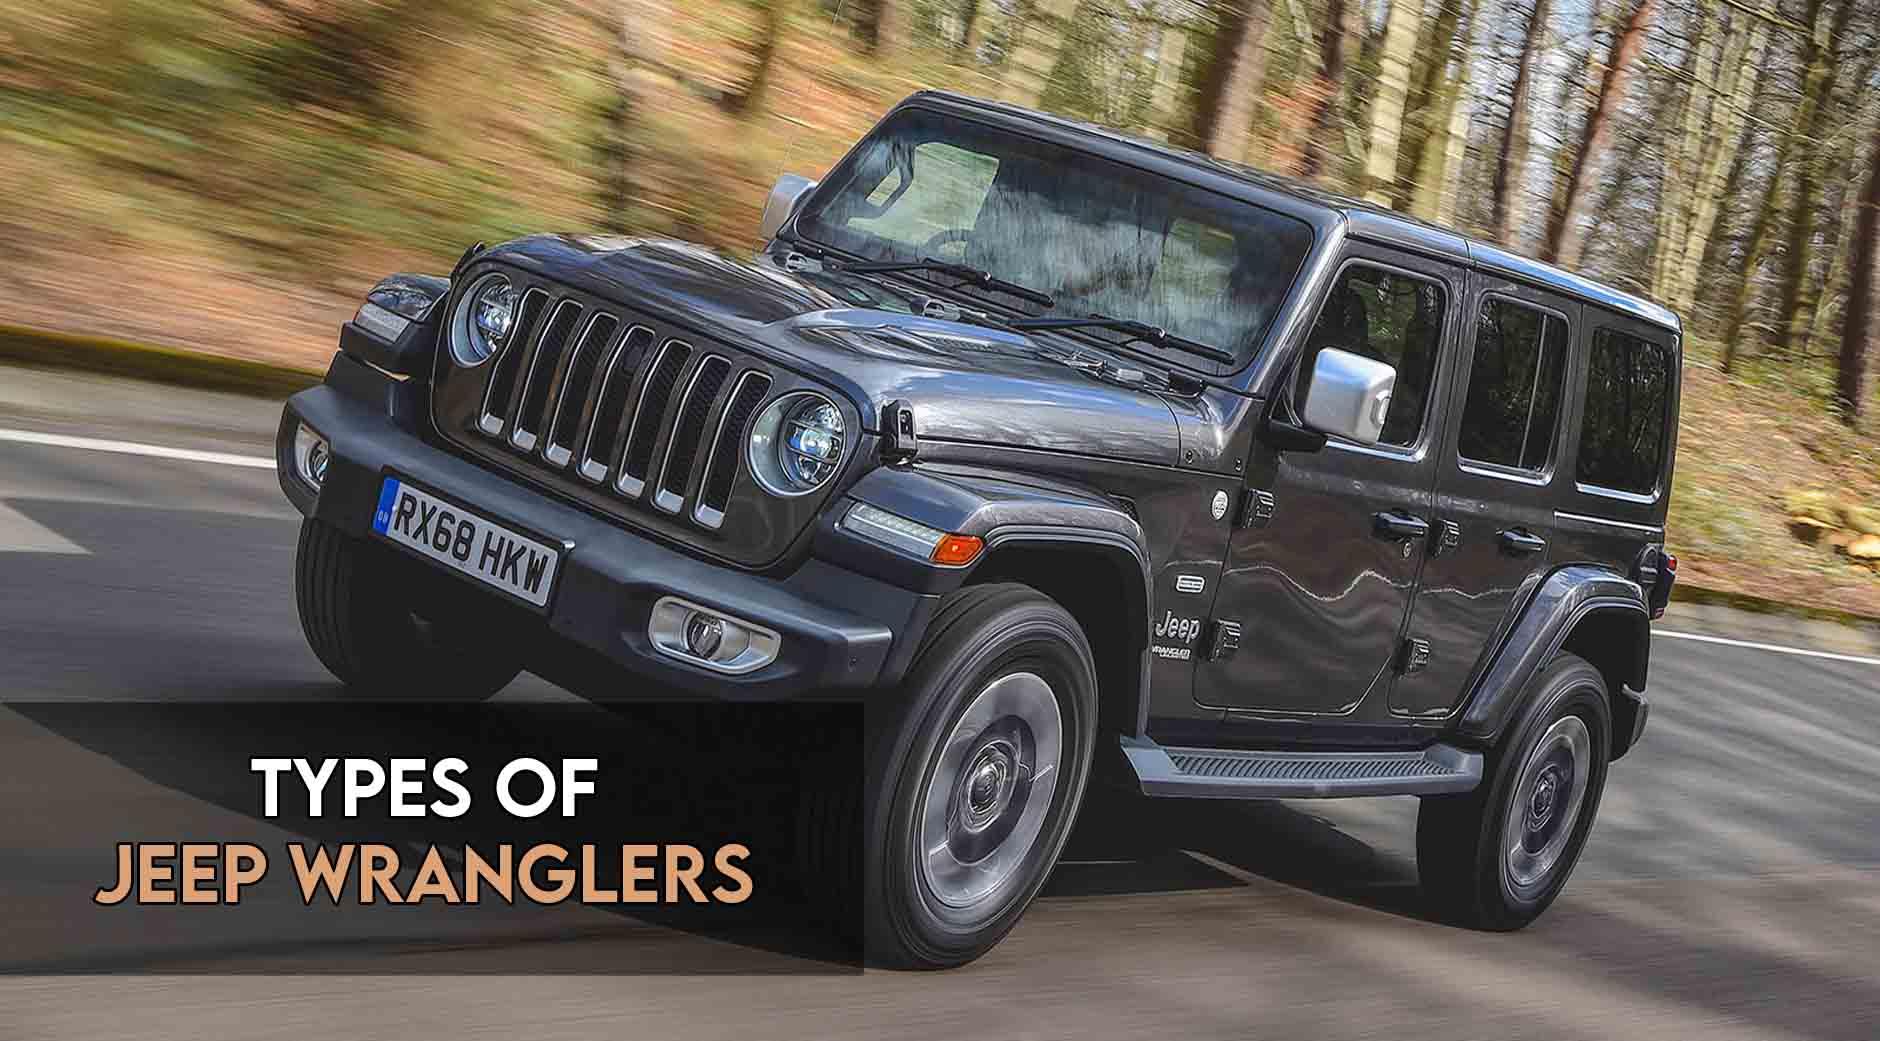 Types of Jeep wranglers